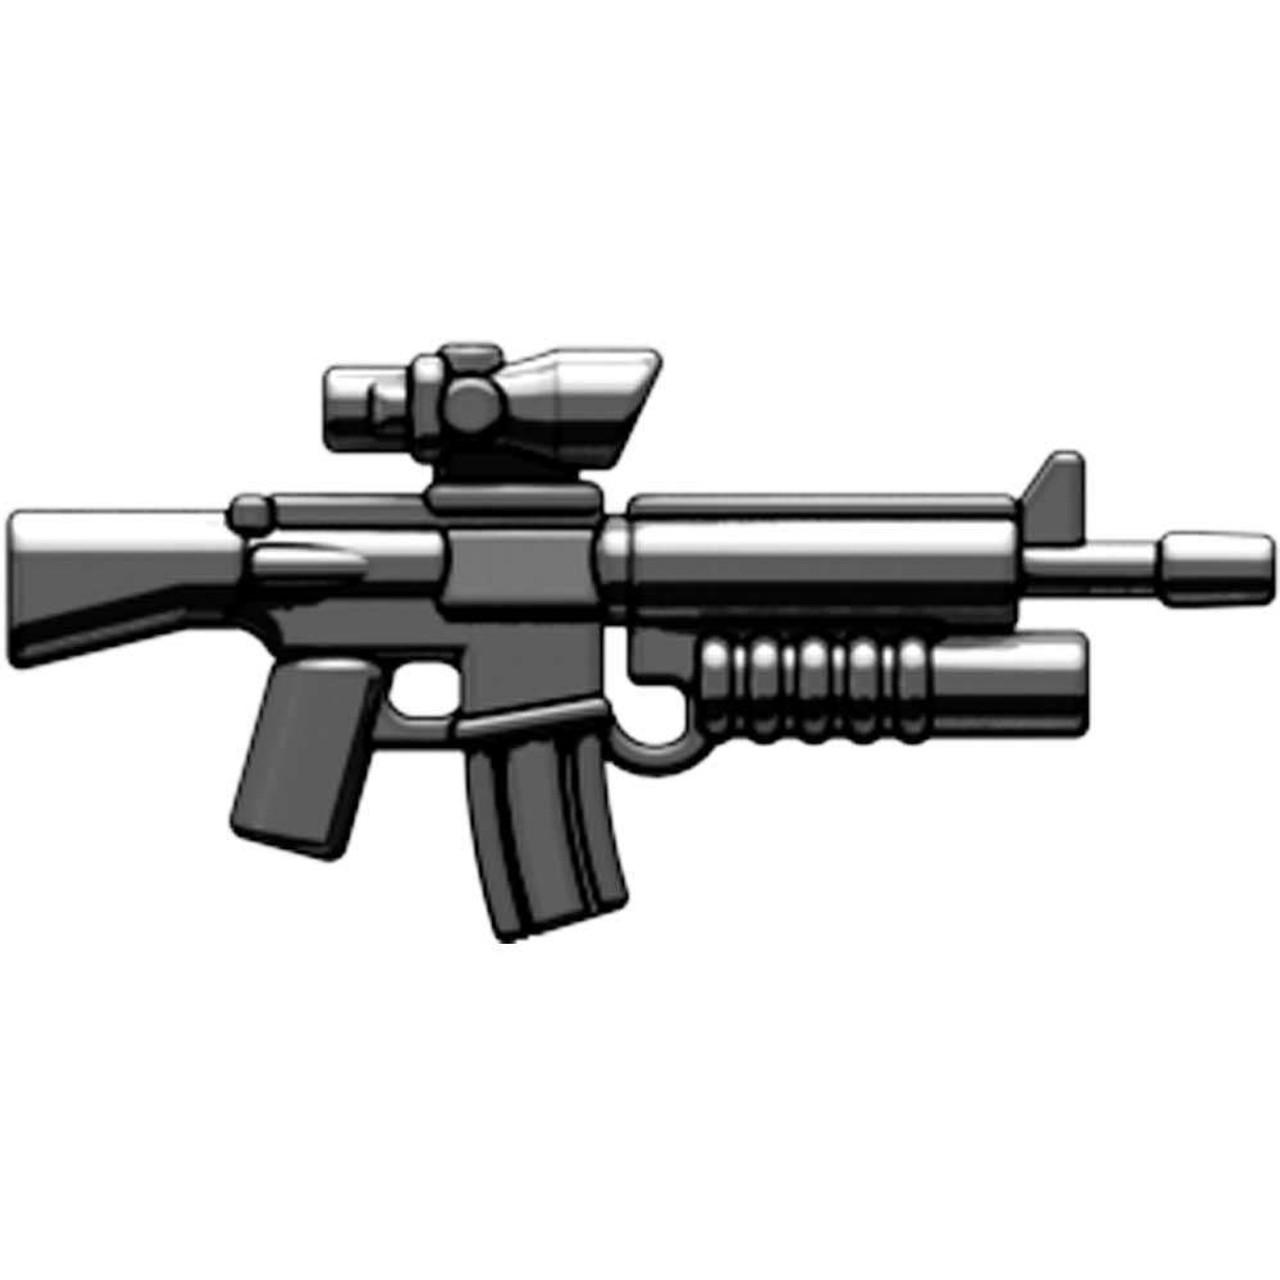 Gallery For > M16 Grenade Launcher Acog M16 Acog